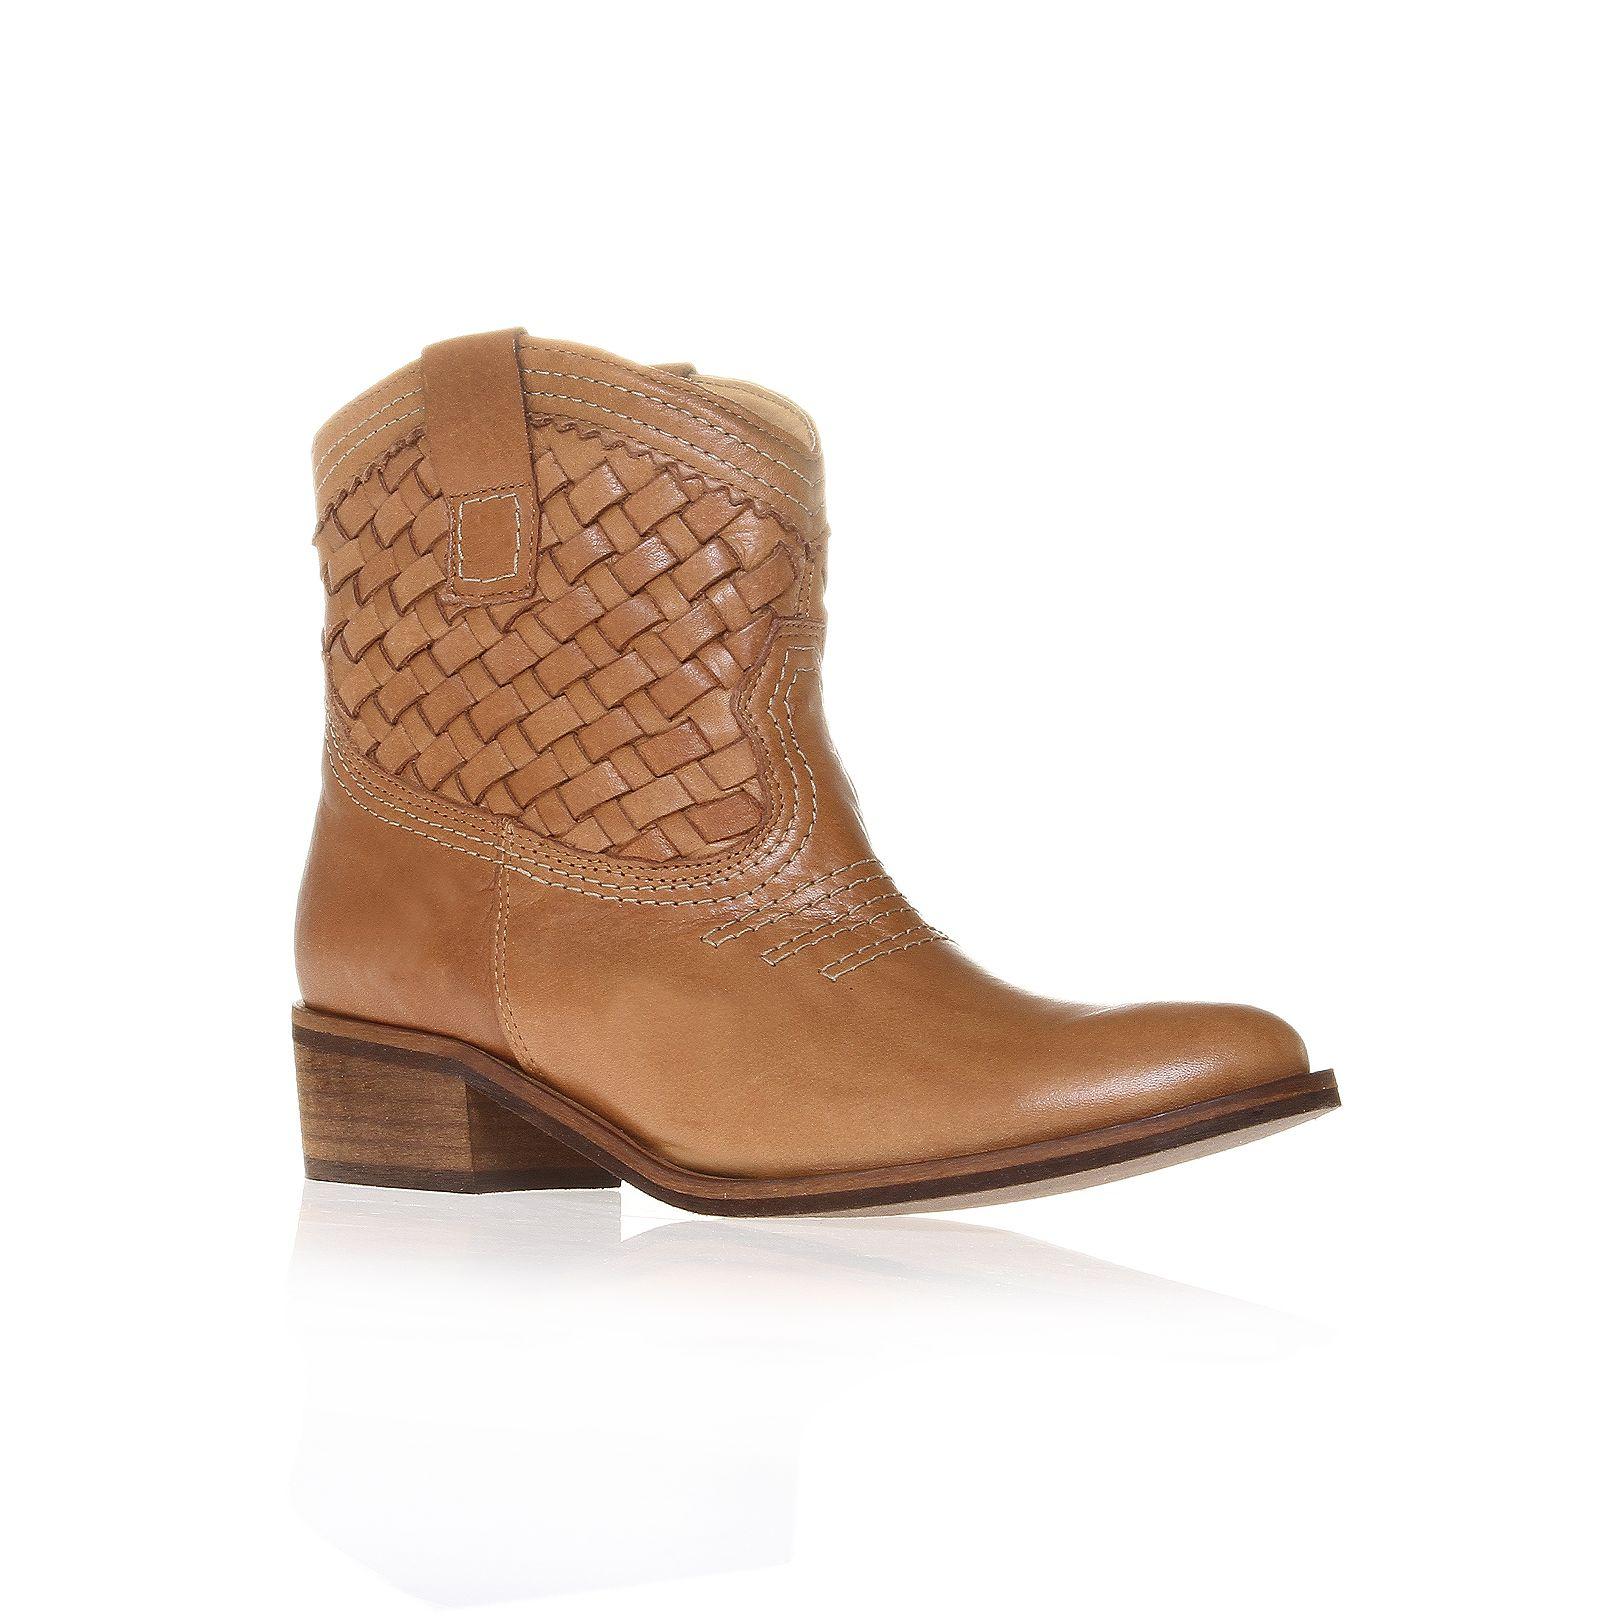 Carvela Kurt Geiger Salt Cowboy Style Ankle Boots In Brown For Men (Tan)   Lyst